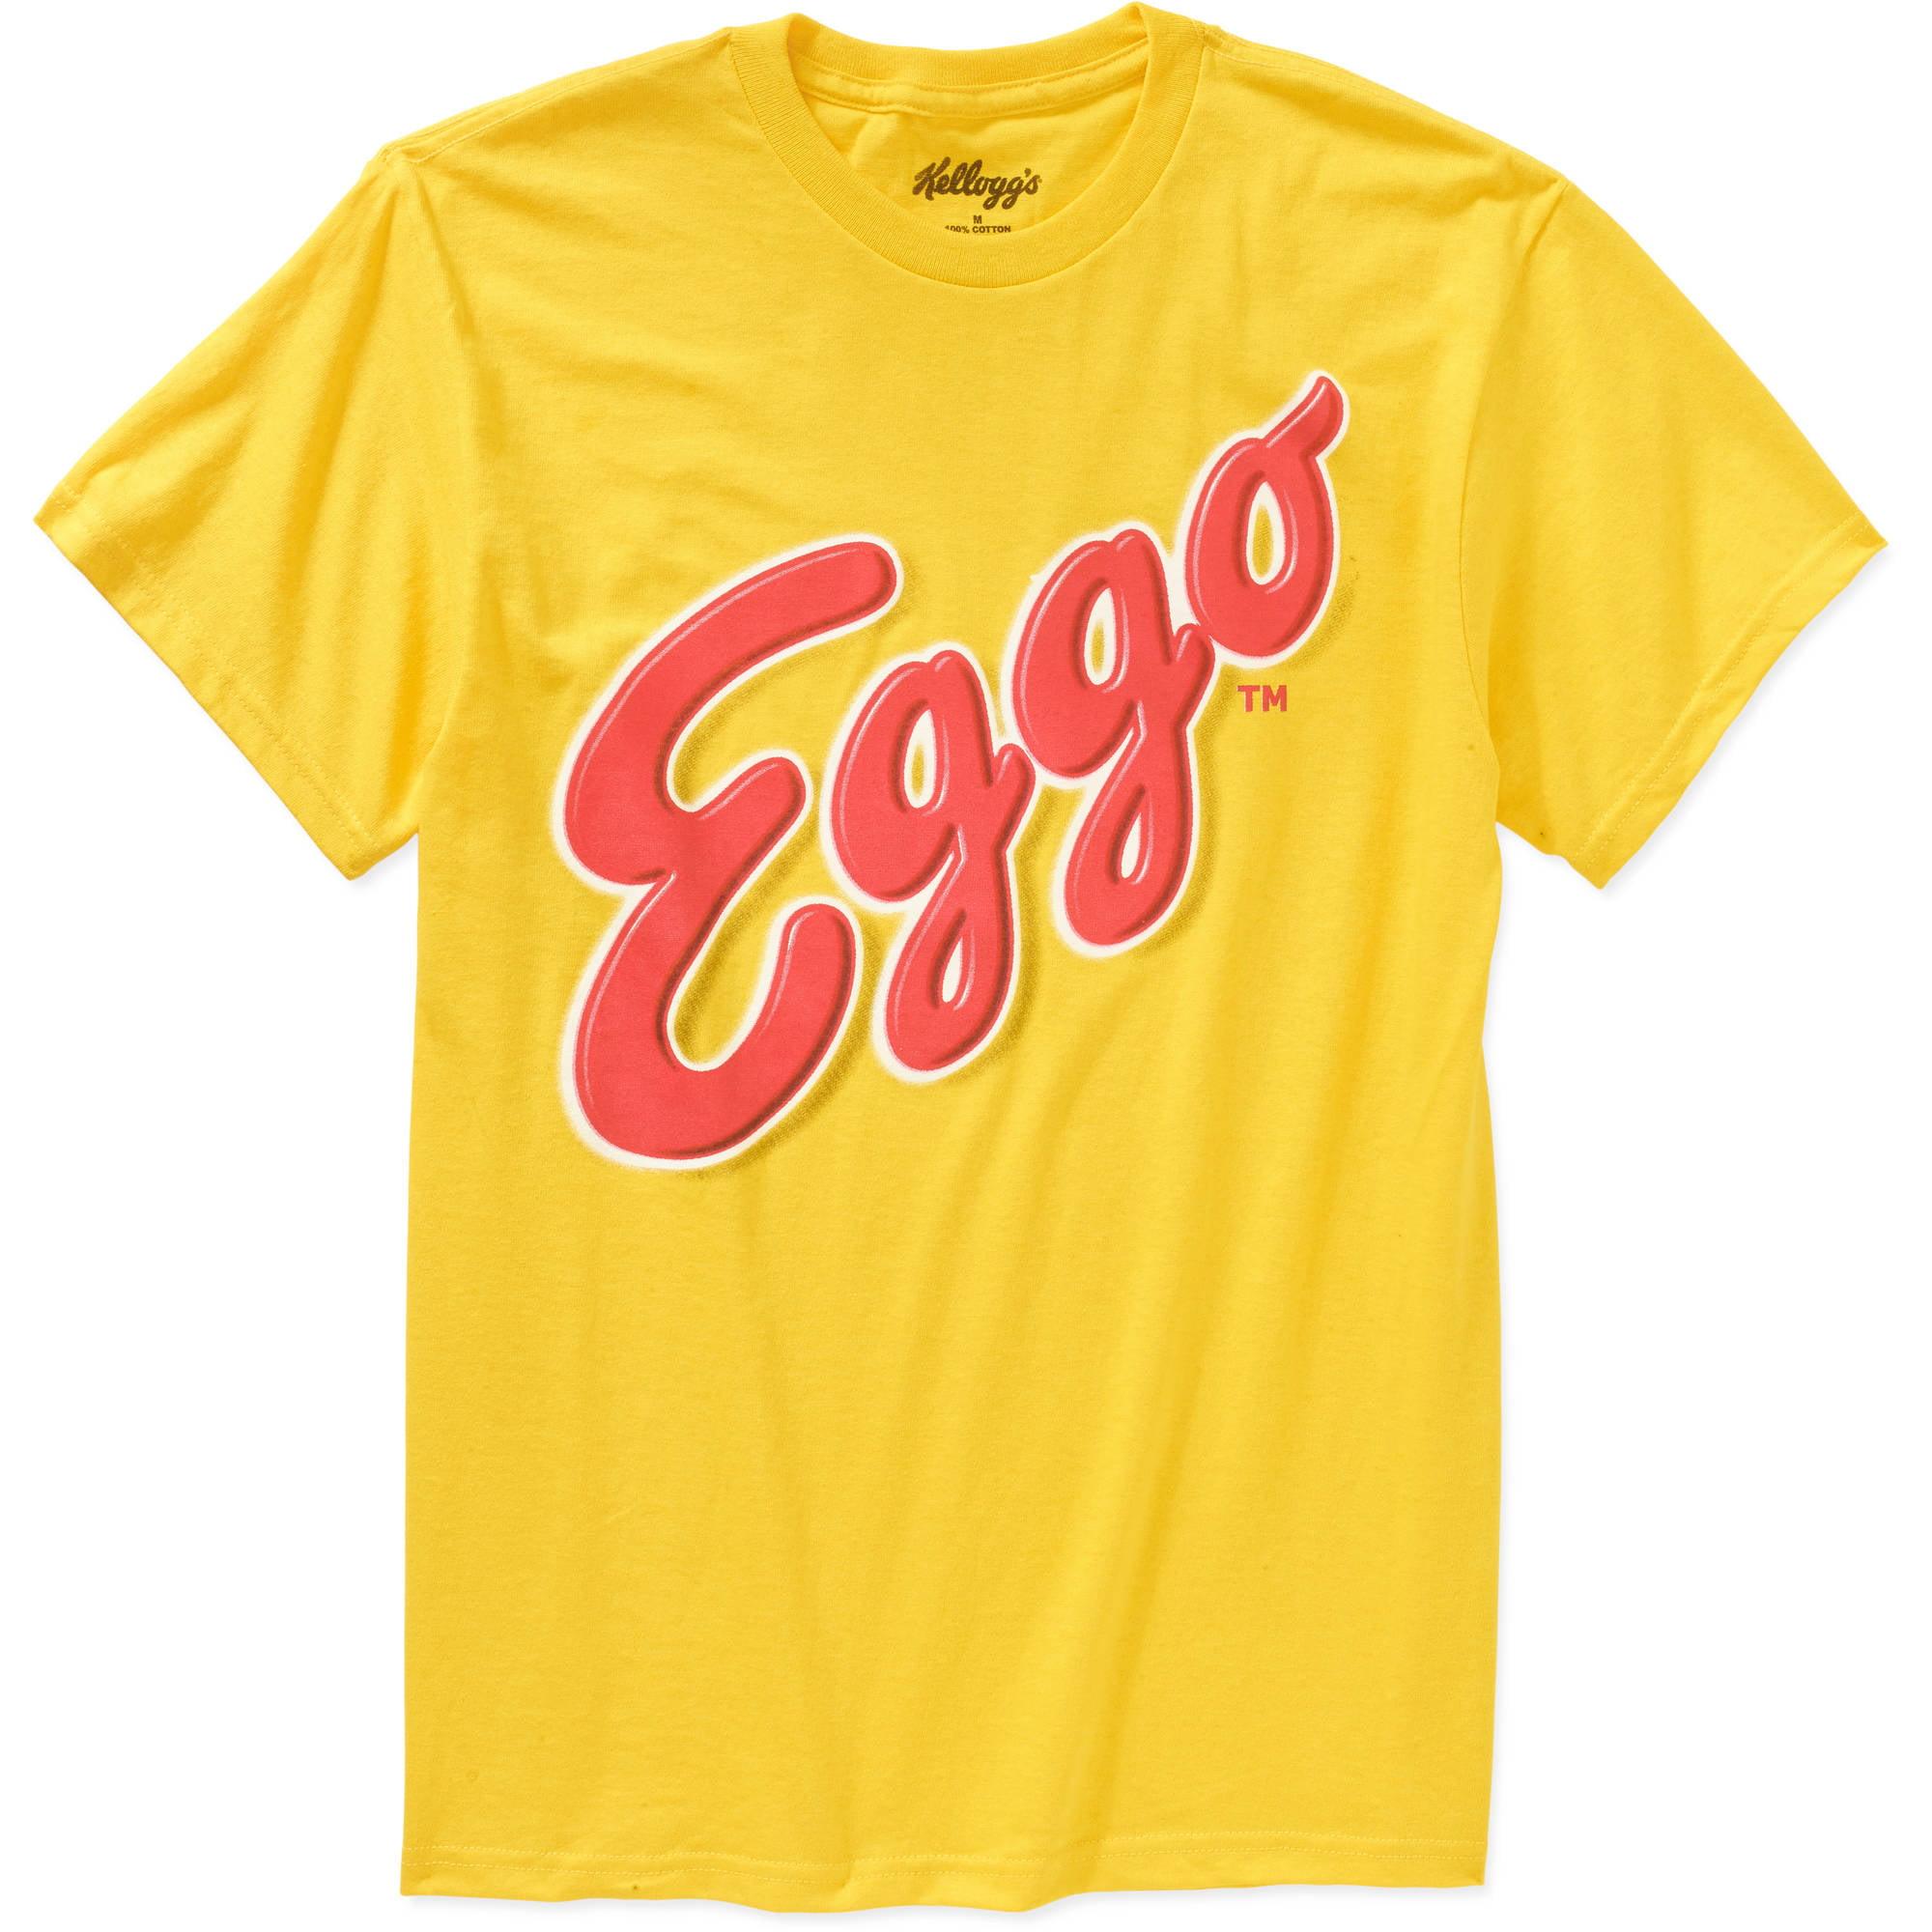 Eggo Logo Big Men's Graphic Tee